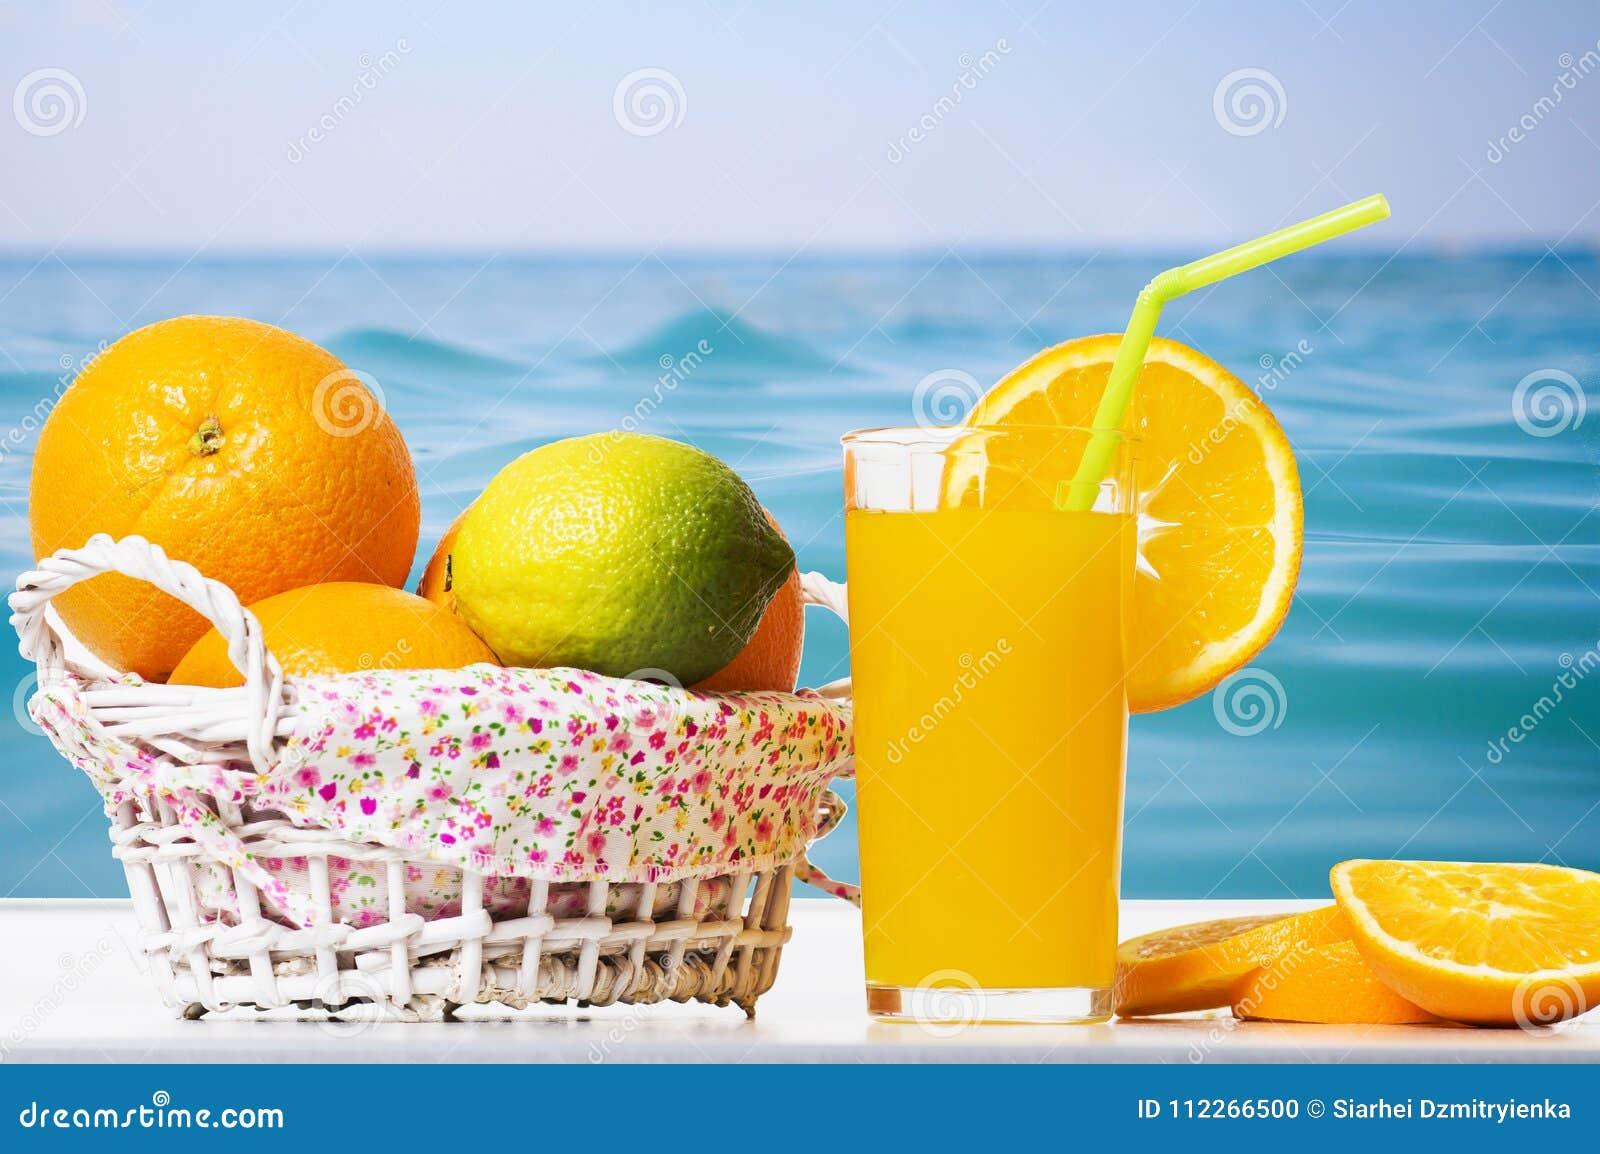 Fresh orange juice, orange slices and oranges in basket against background of surface blue sea. Summer tropical citrus fruits